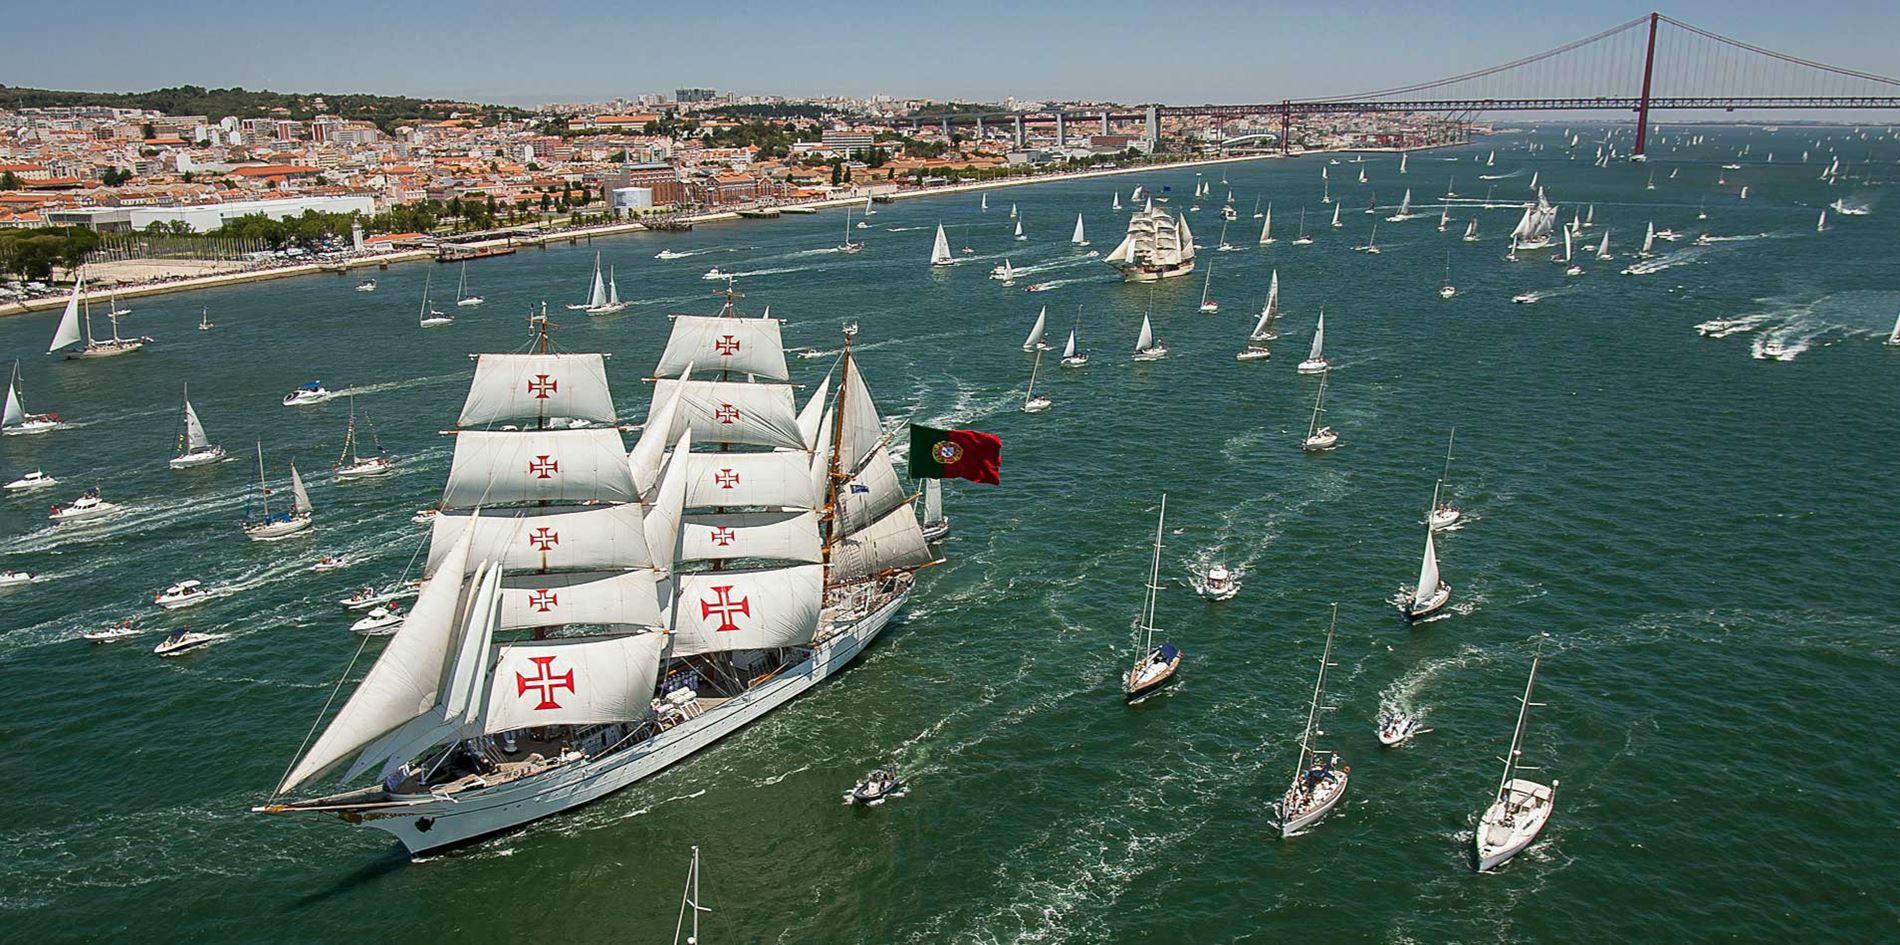 Lisbon Tall Ships Races 2016